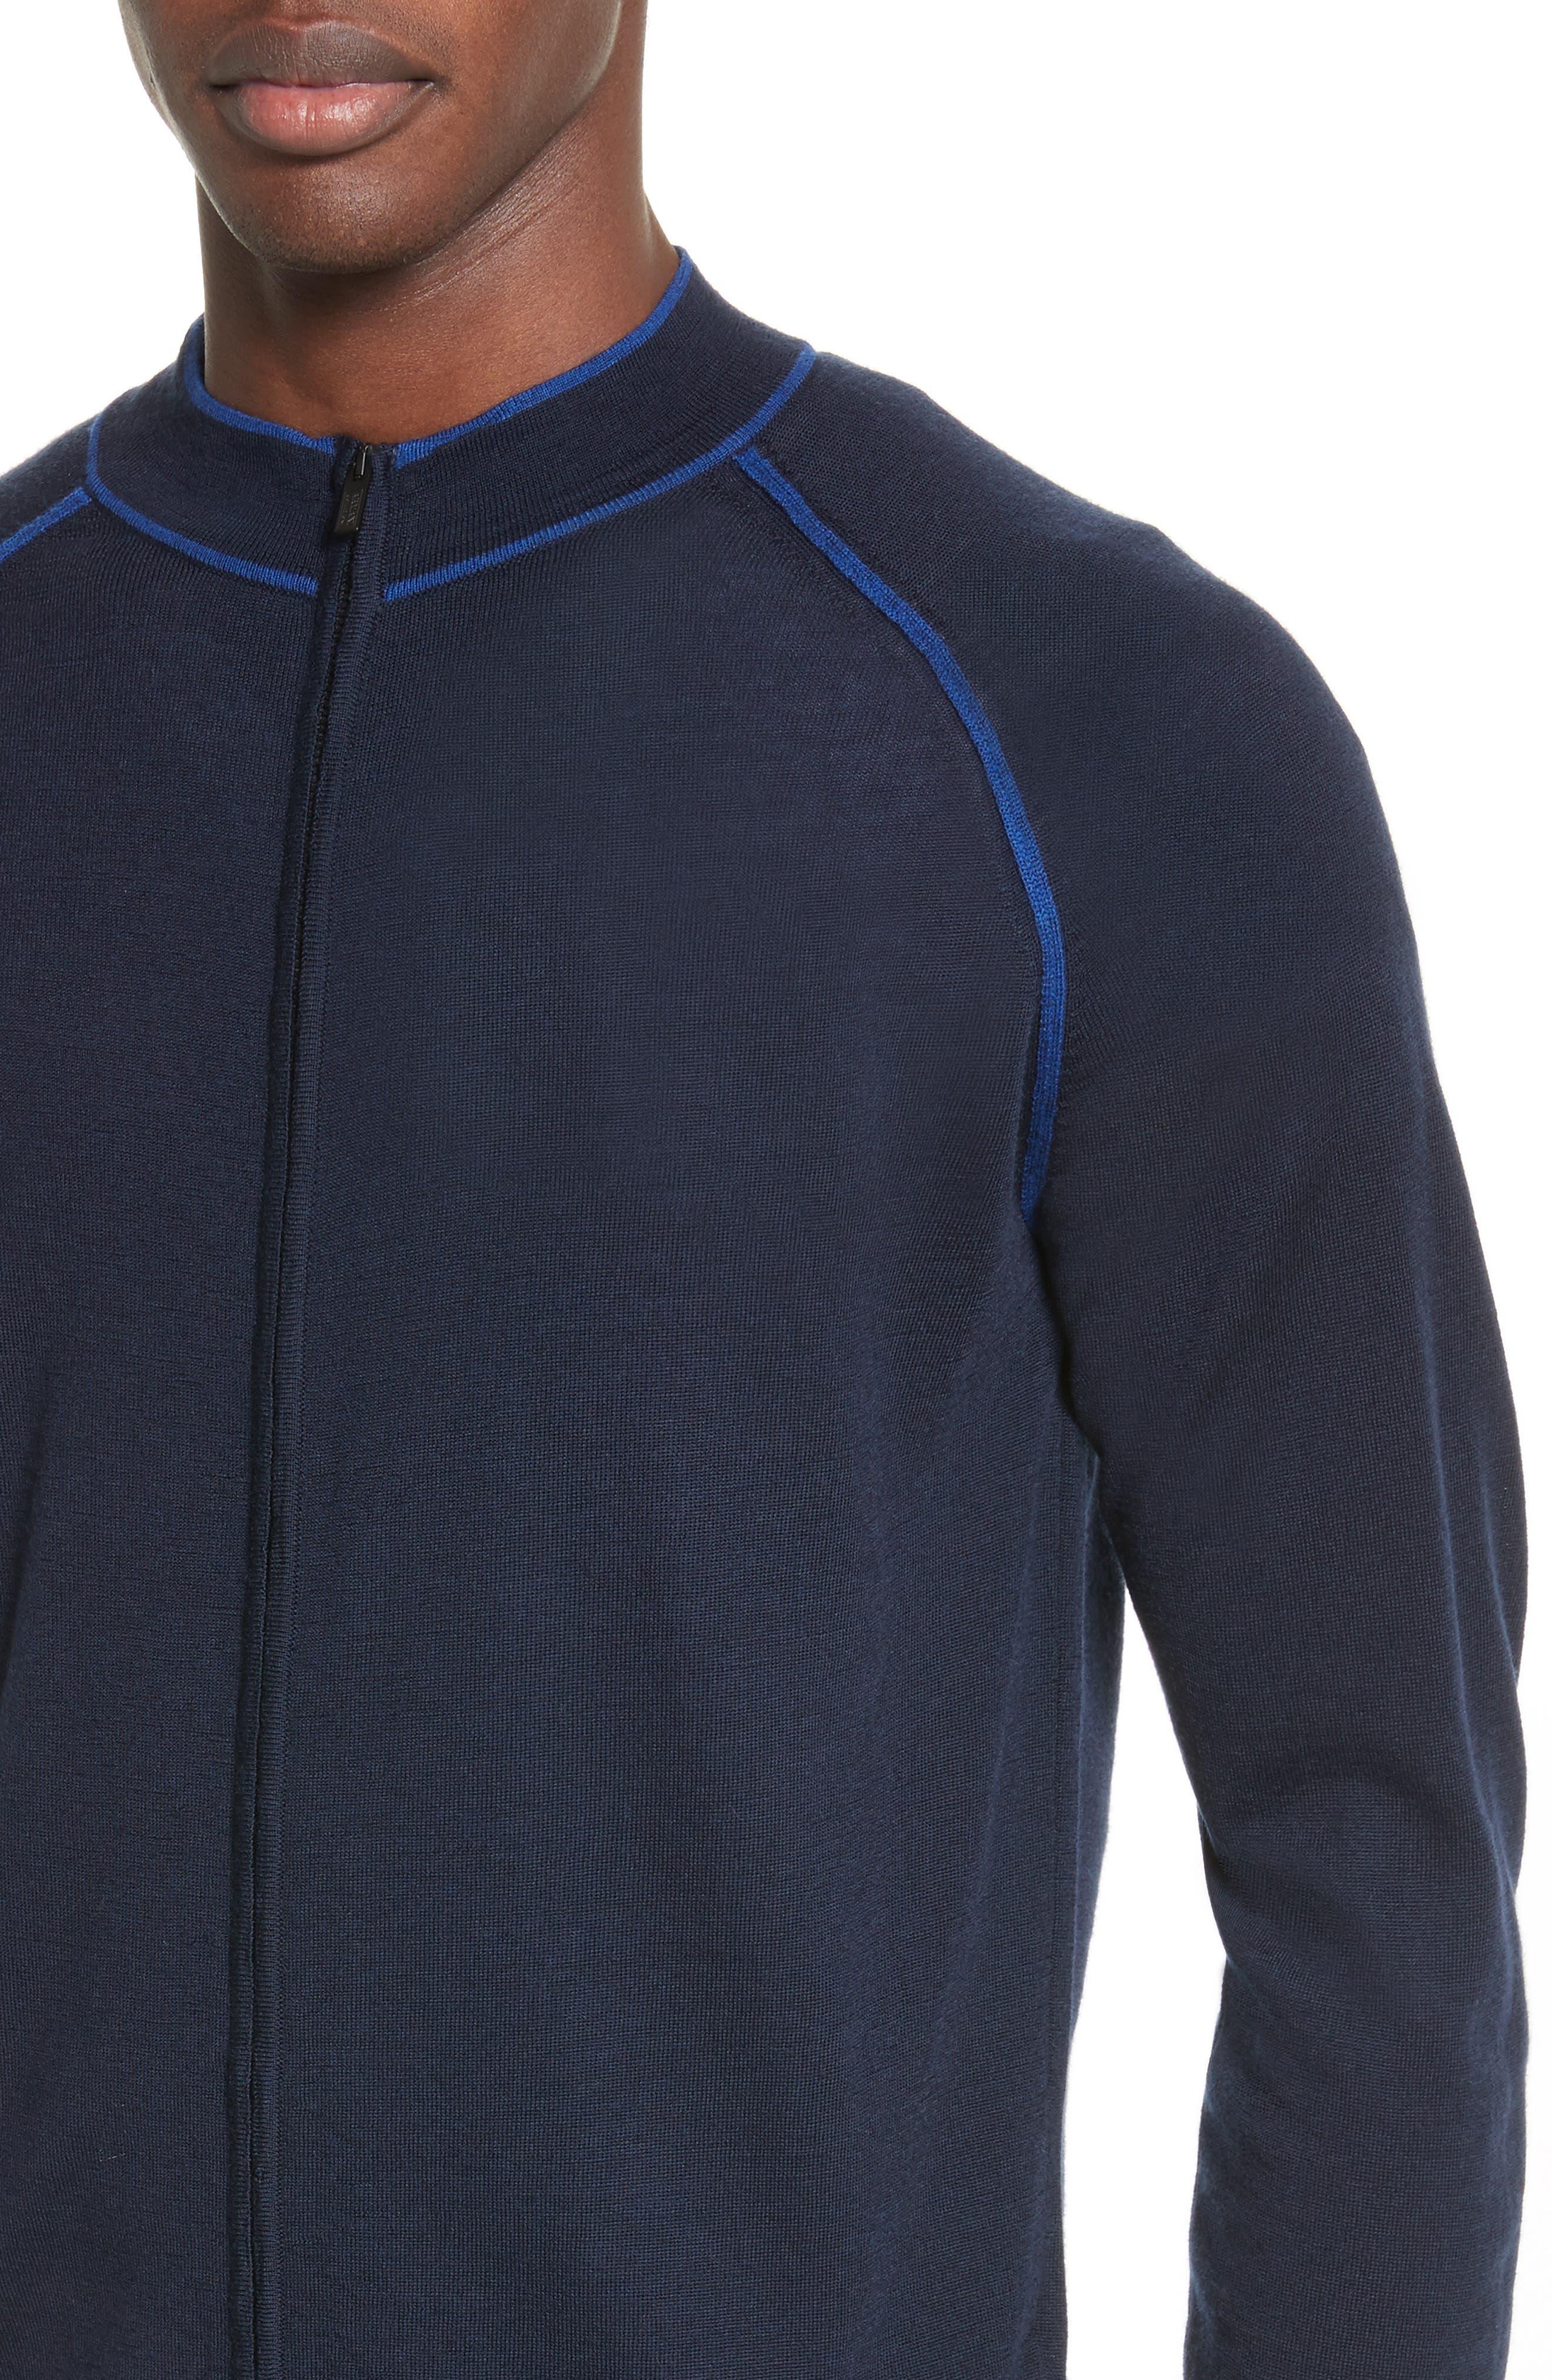 Zip Front Raglan Sweatshirt,                             Alternate thumbnail 4, color,                             414